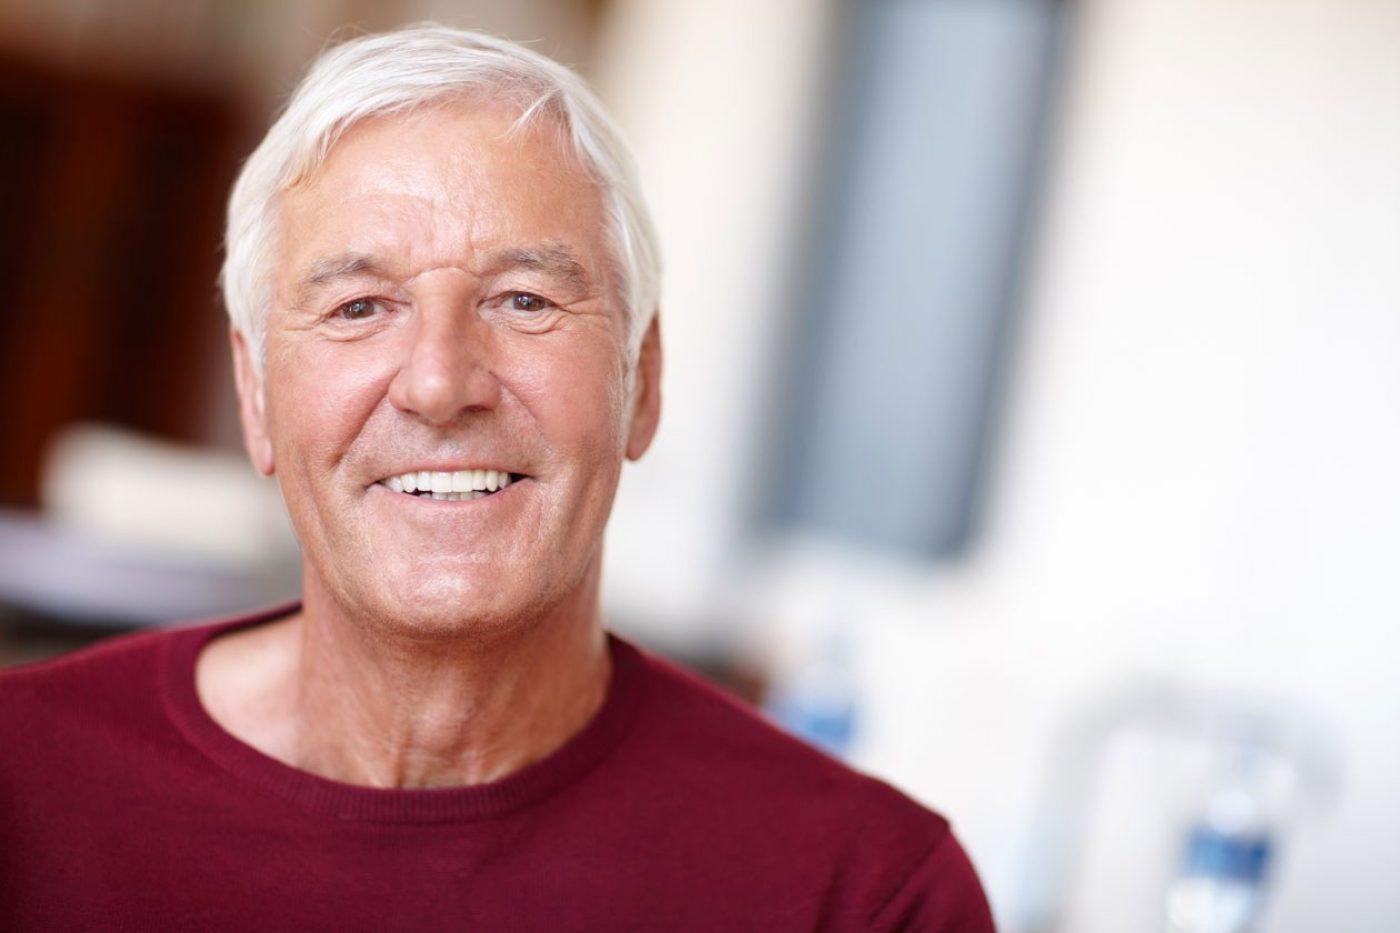 Freemanrosser Carmarthen Dental Implants Implantsecureddentures